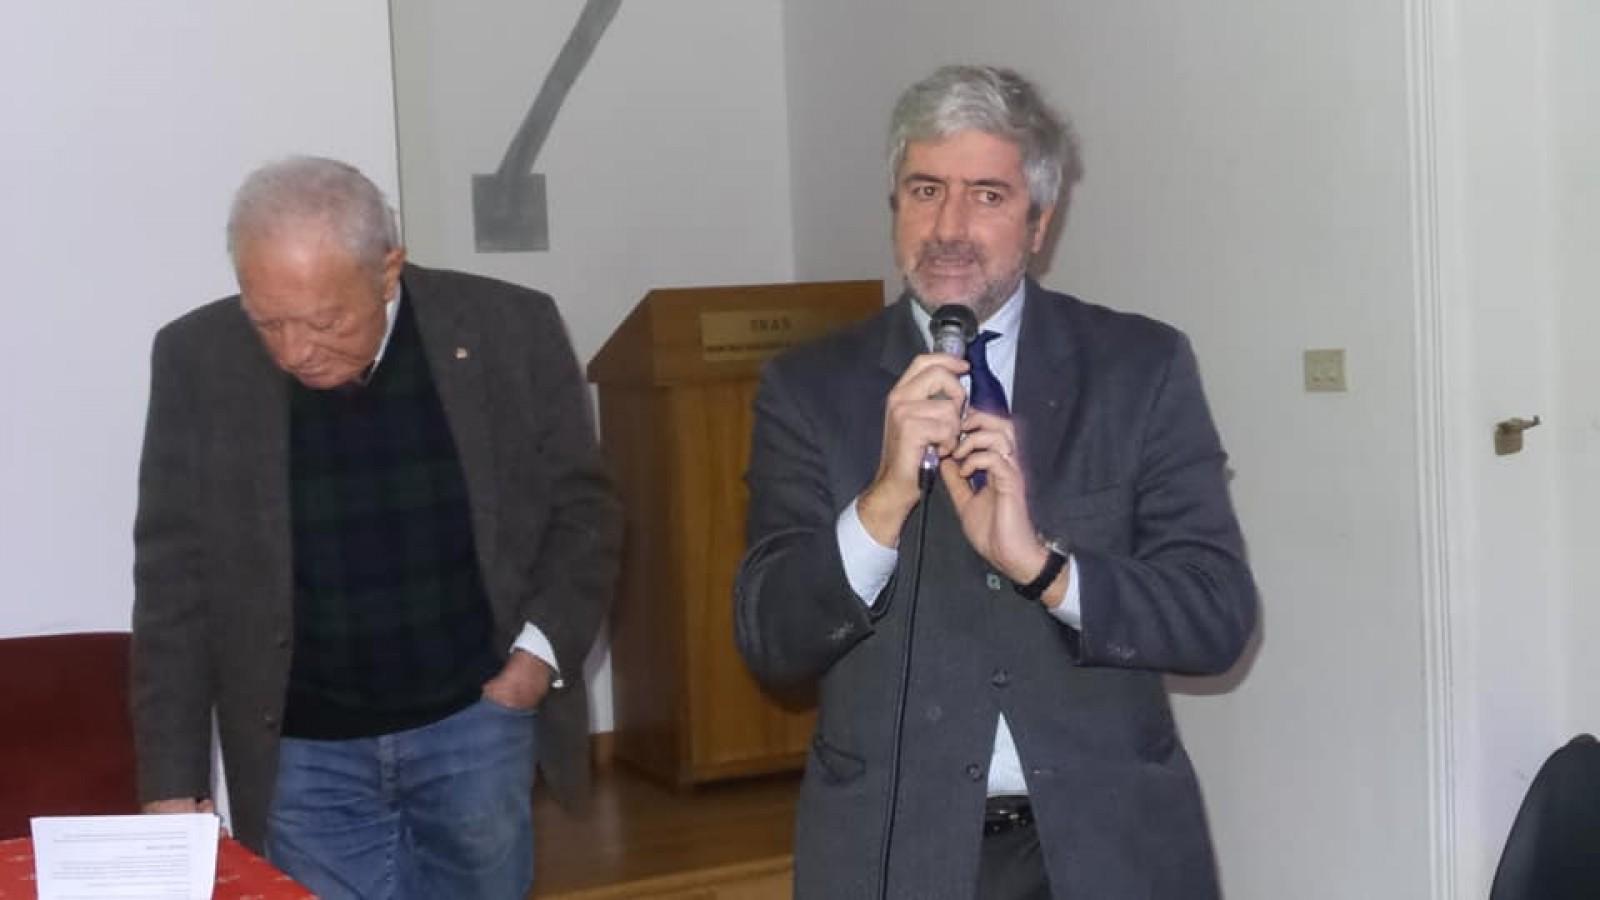 Gallery - Convention dell'Associazione Virgilio 2080